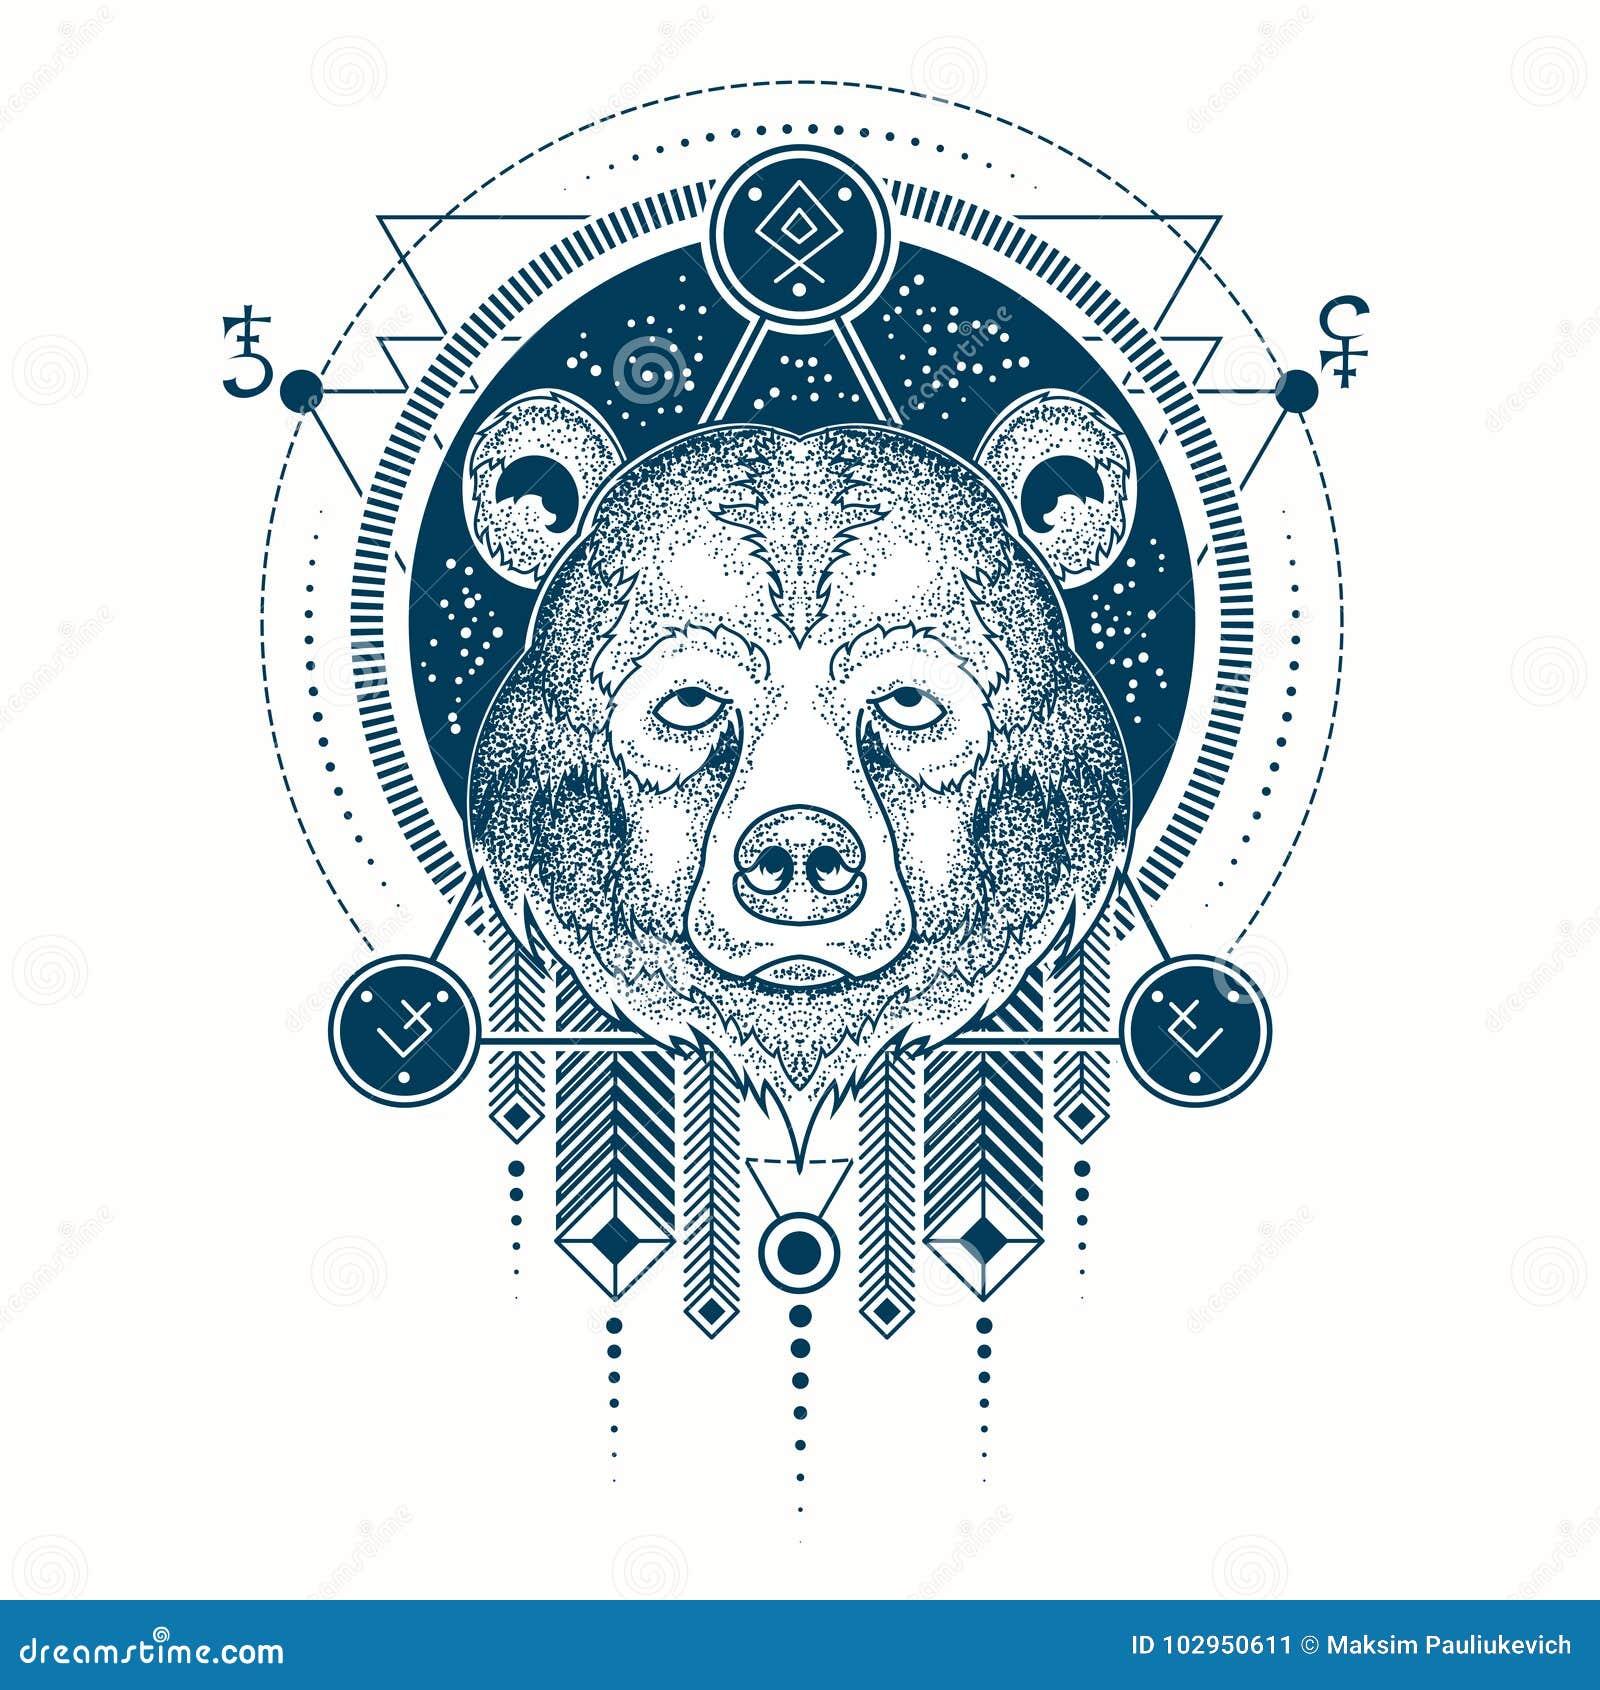 Ejemplo De Una Vista Delantera Del Tatuaje Geométrico De Una Cabeza